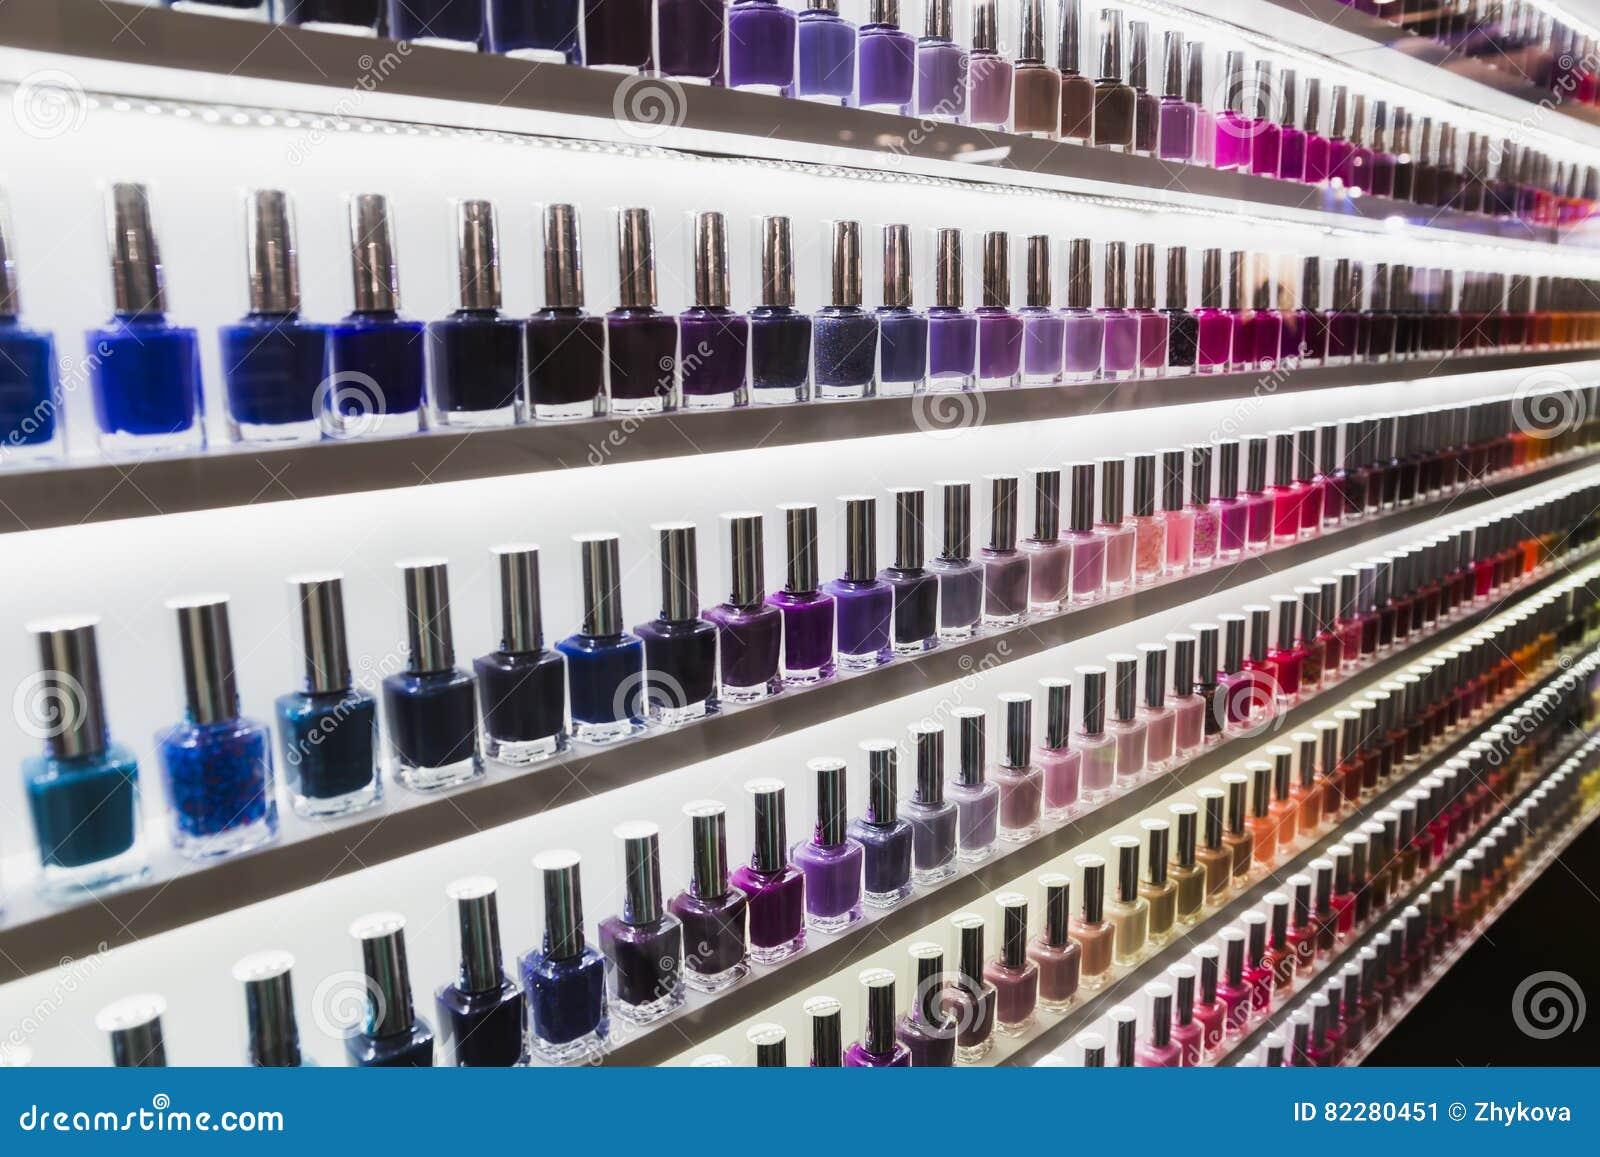 Nail Polish Collar Color Lakes Stock Image - Image of liquid ...